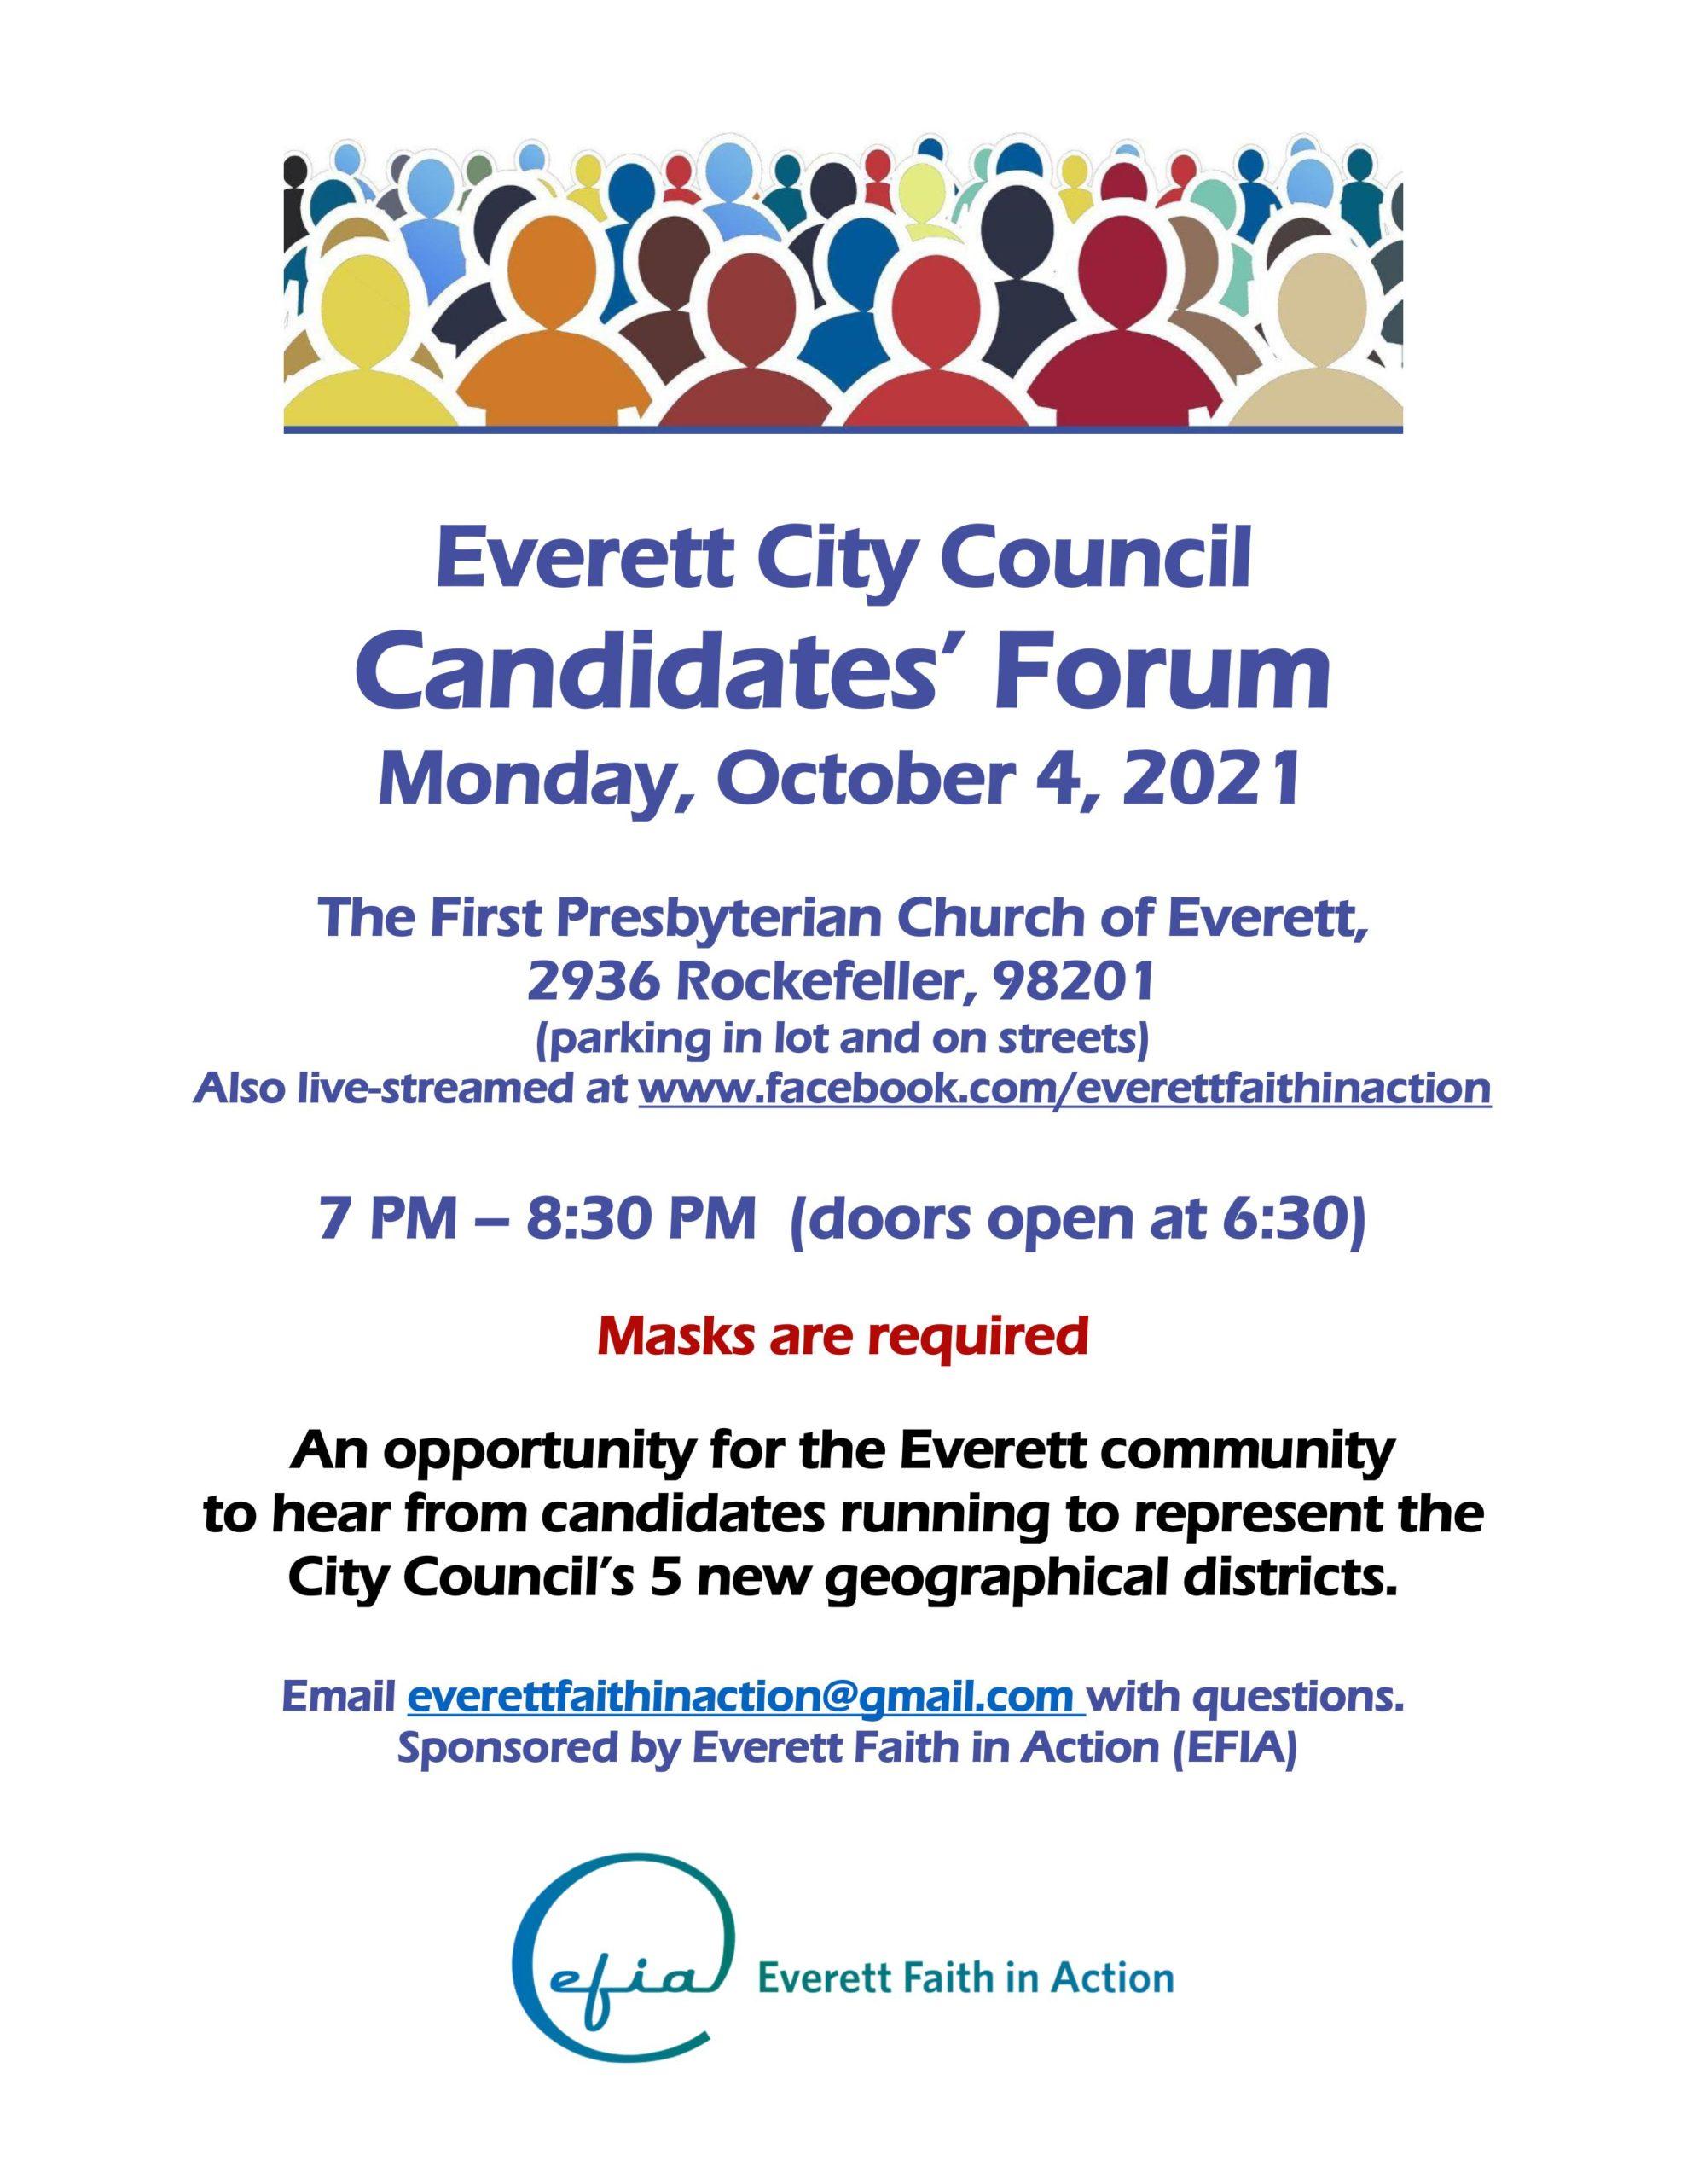 Everett City Council Candidates' Forum